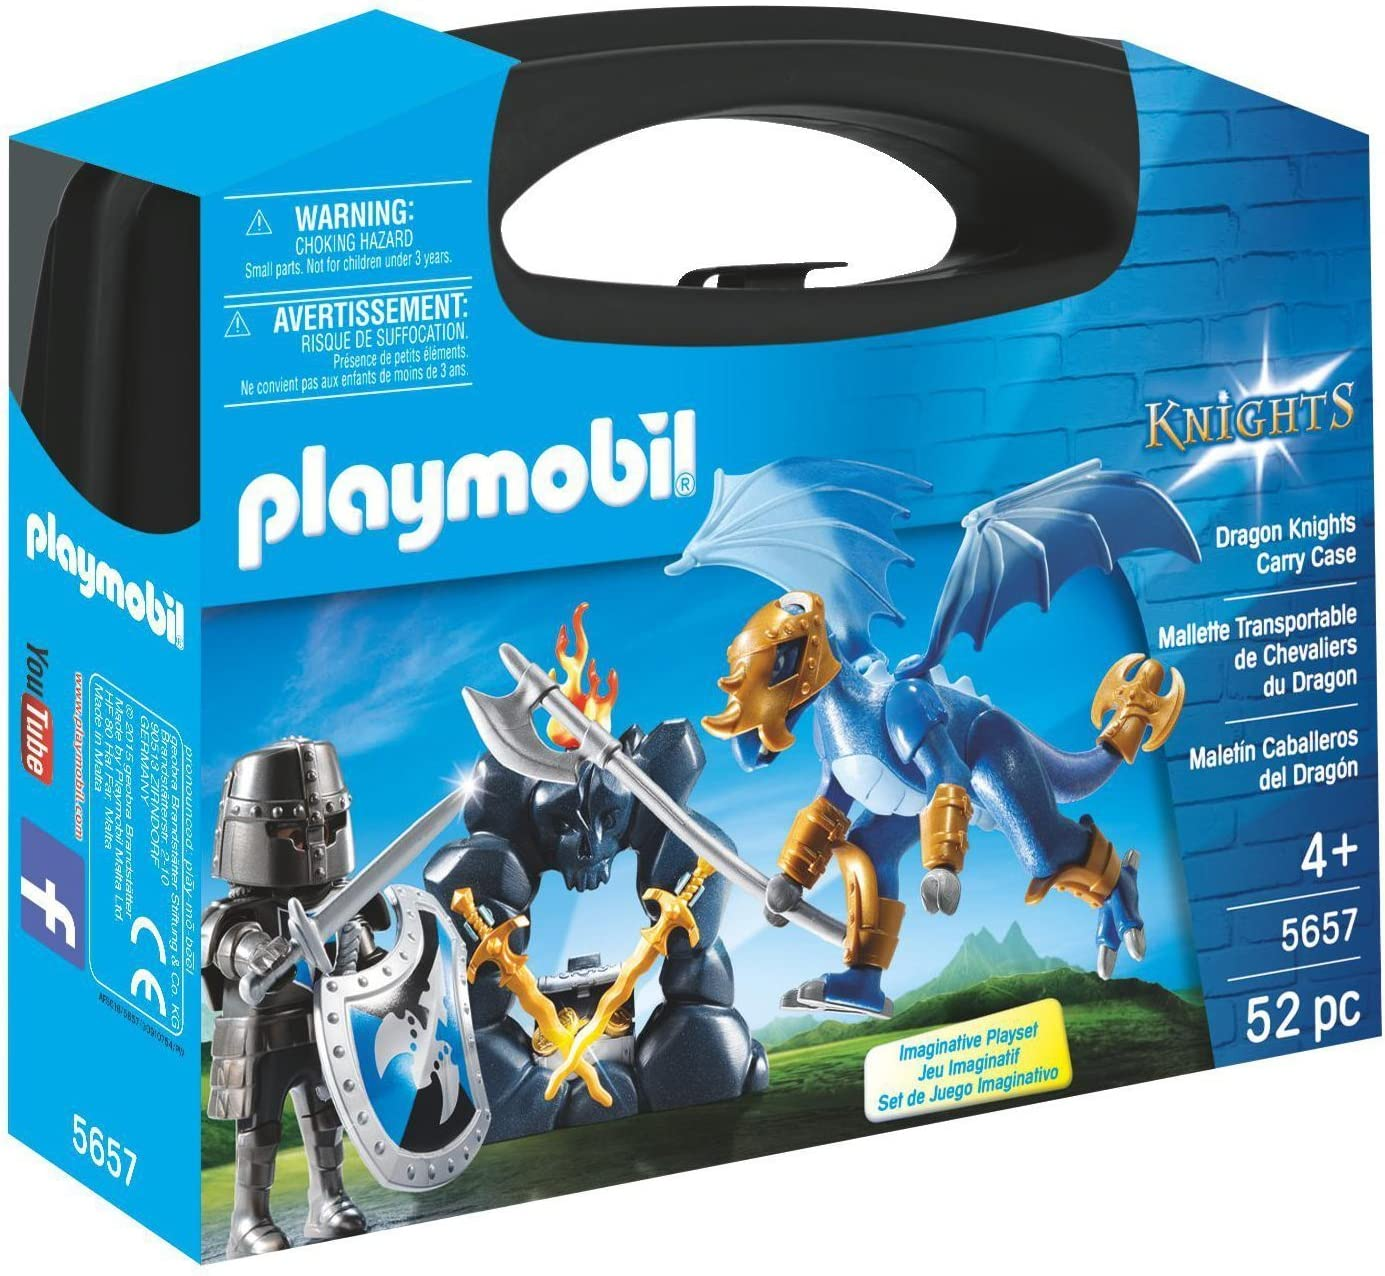 PLAYMOBIL Caballeros- Autre Playset, Color Otro, Miscelanea (5657)